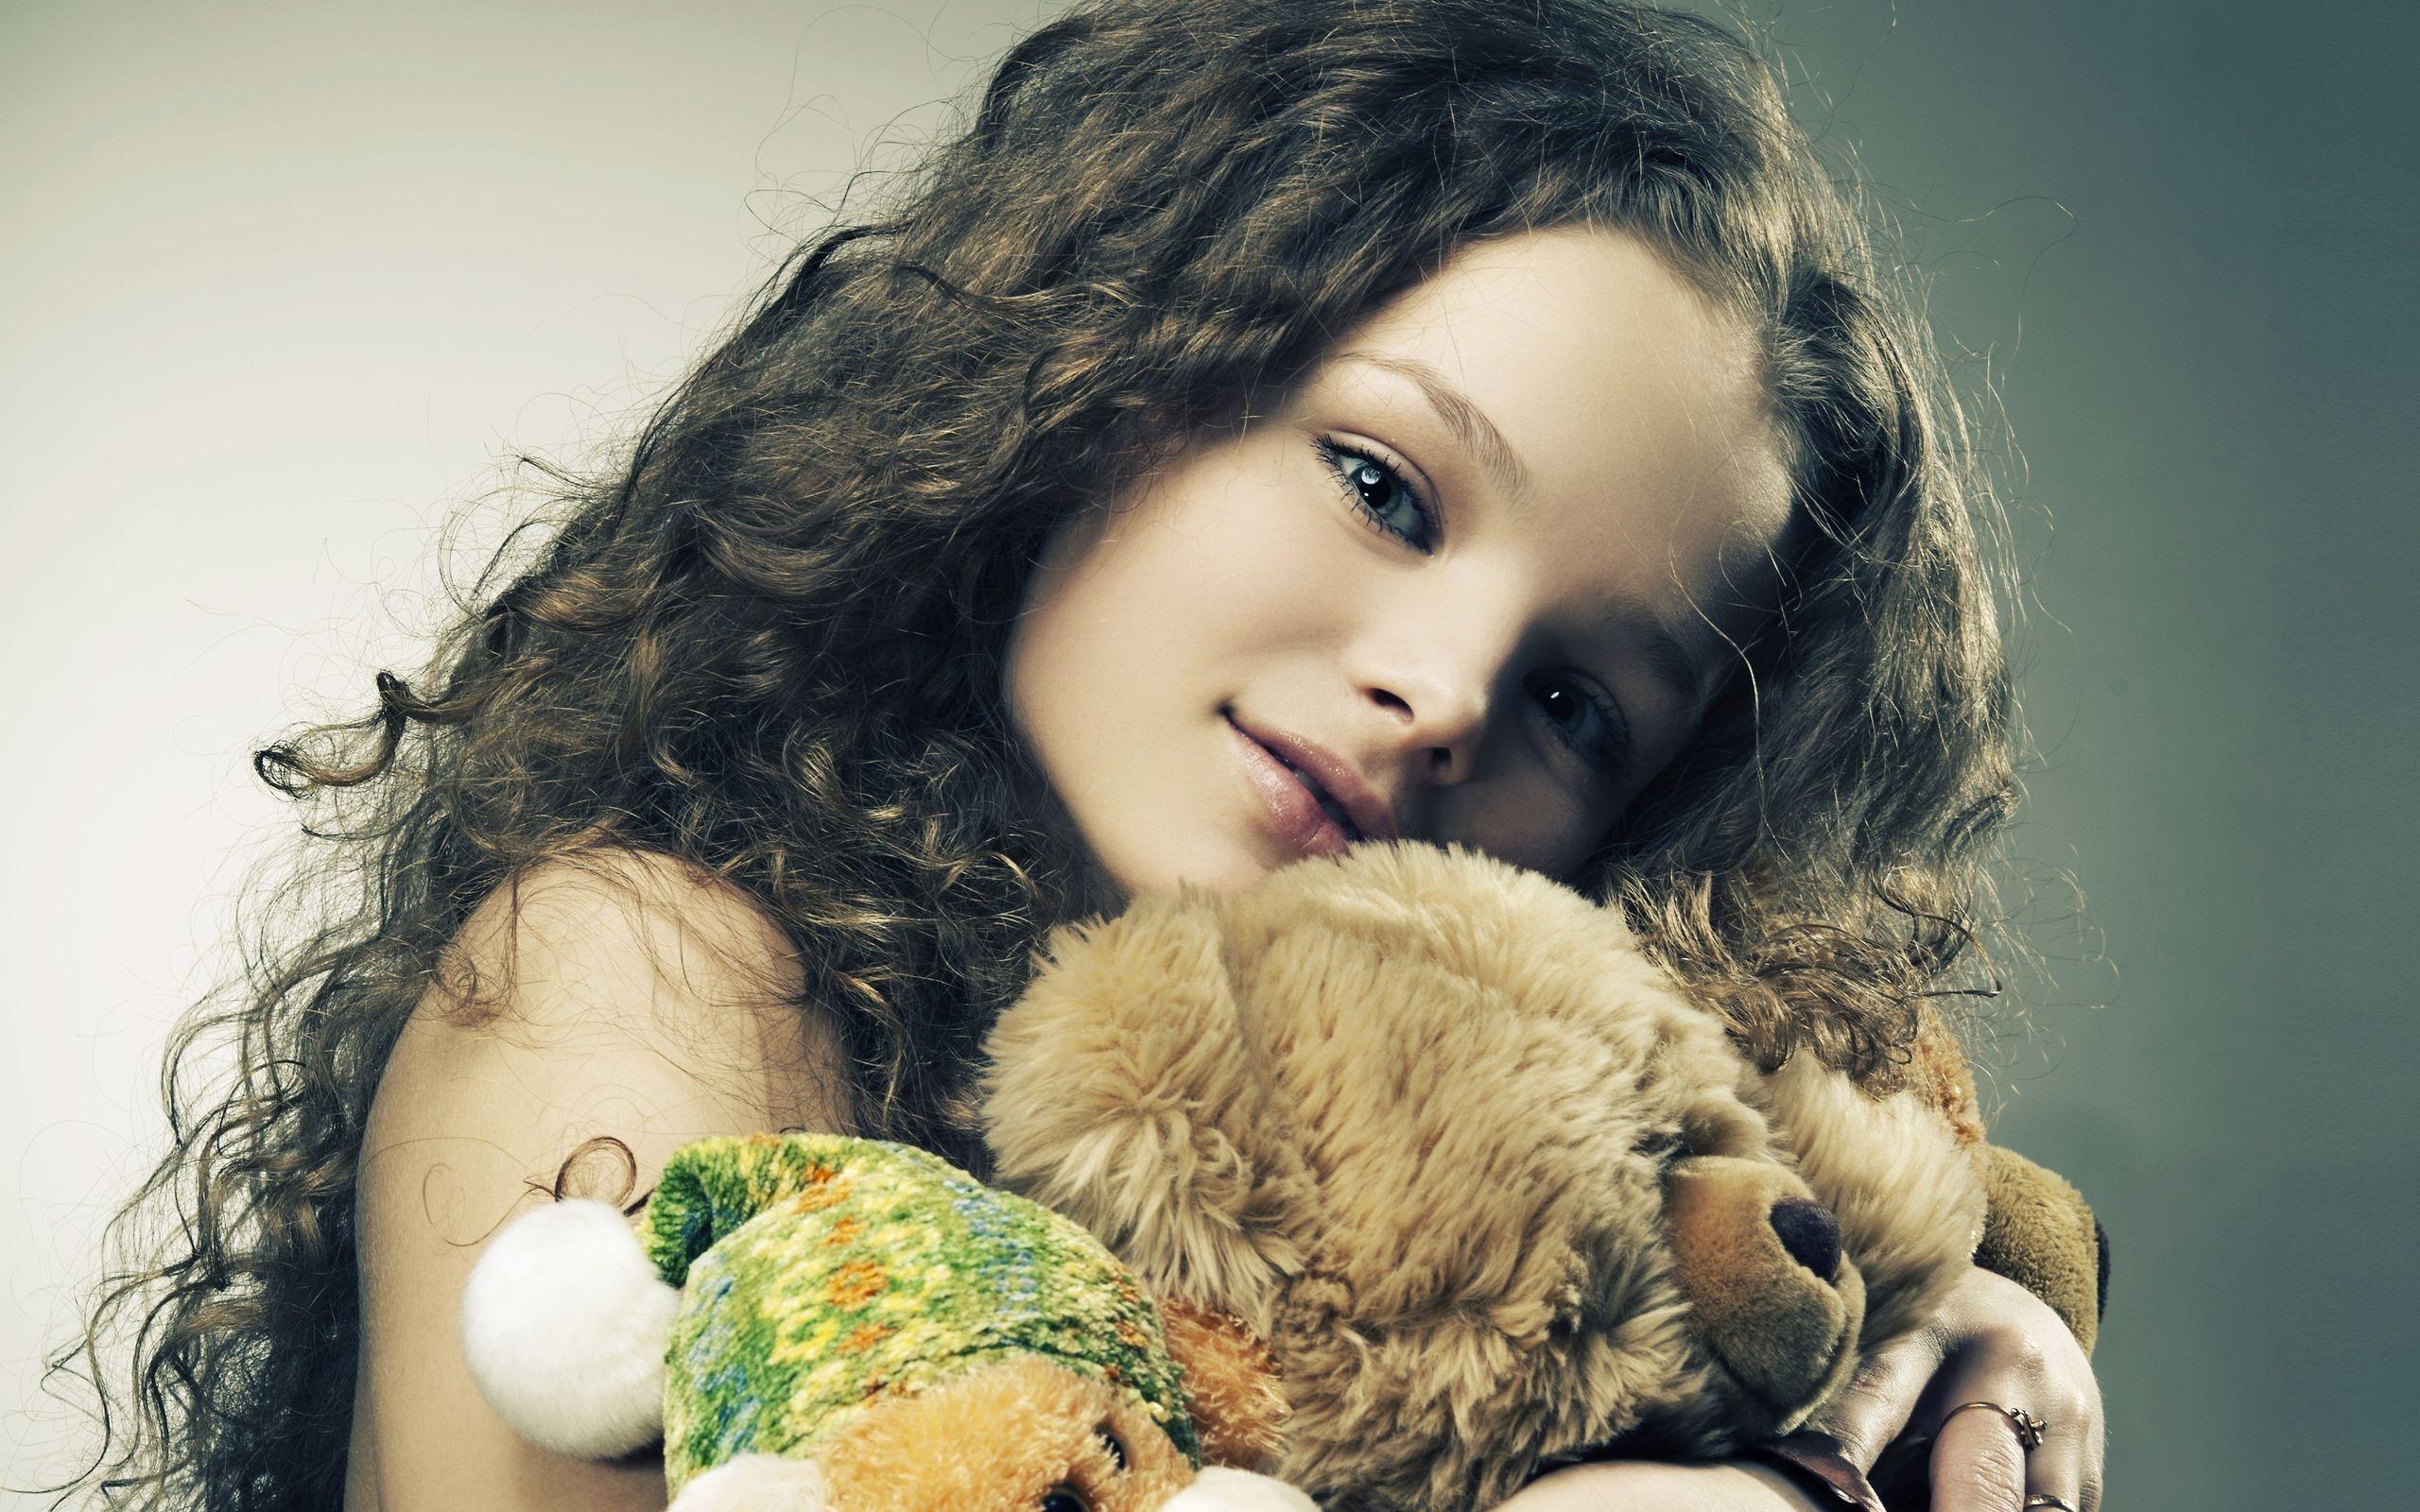 Девочки с игрушками фото 71-247